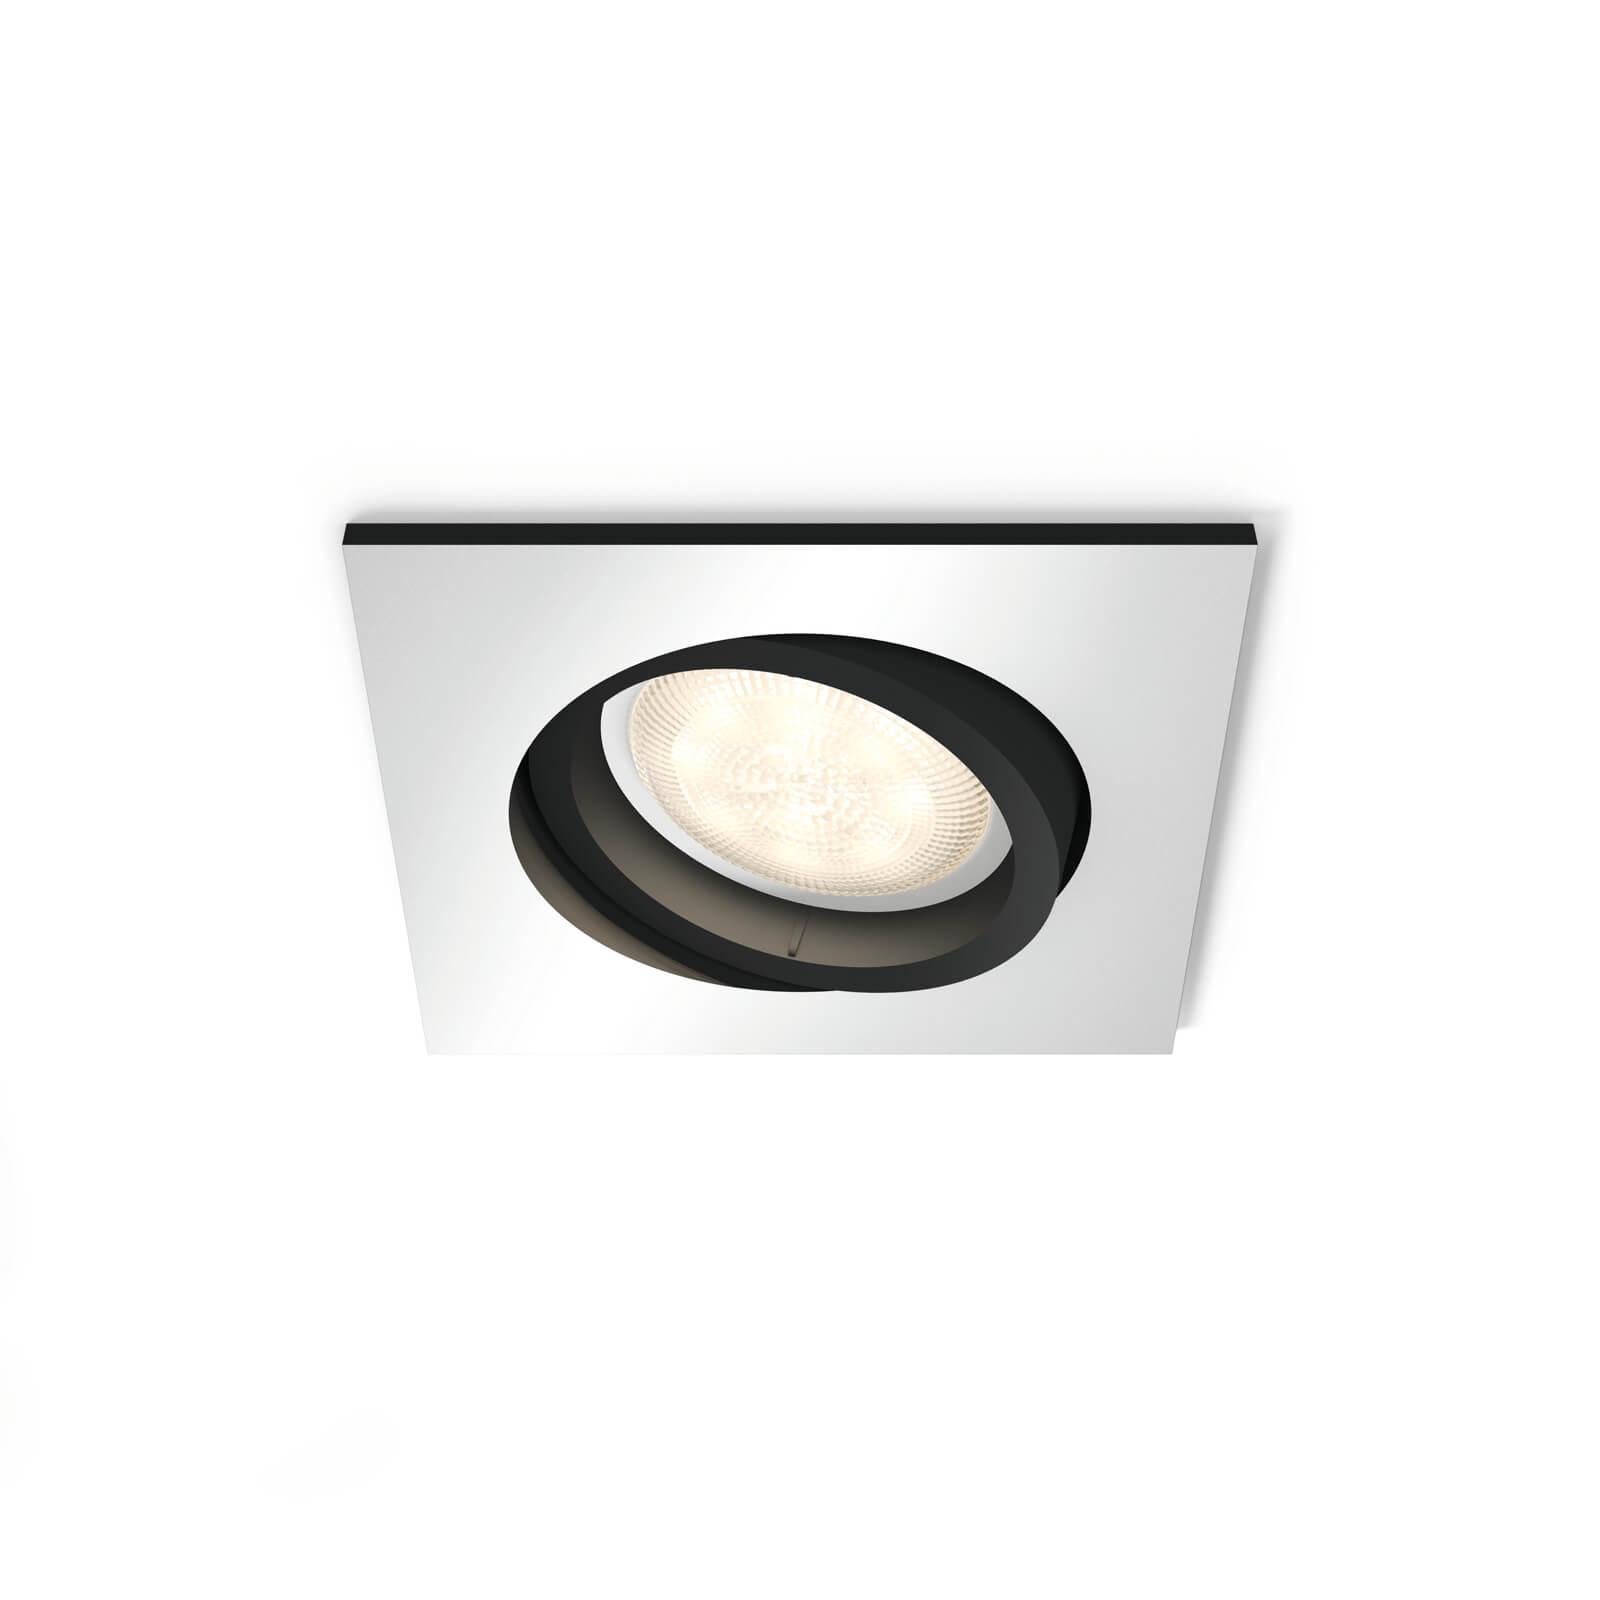 philips hue milliskin inbouwspot aluminium vierkant excl dim switch. Black Bedroom Furniture Sets. Home Design Ideas